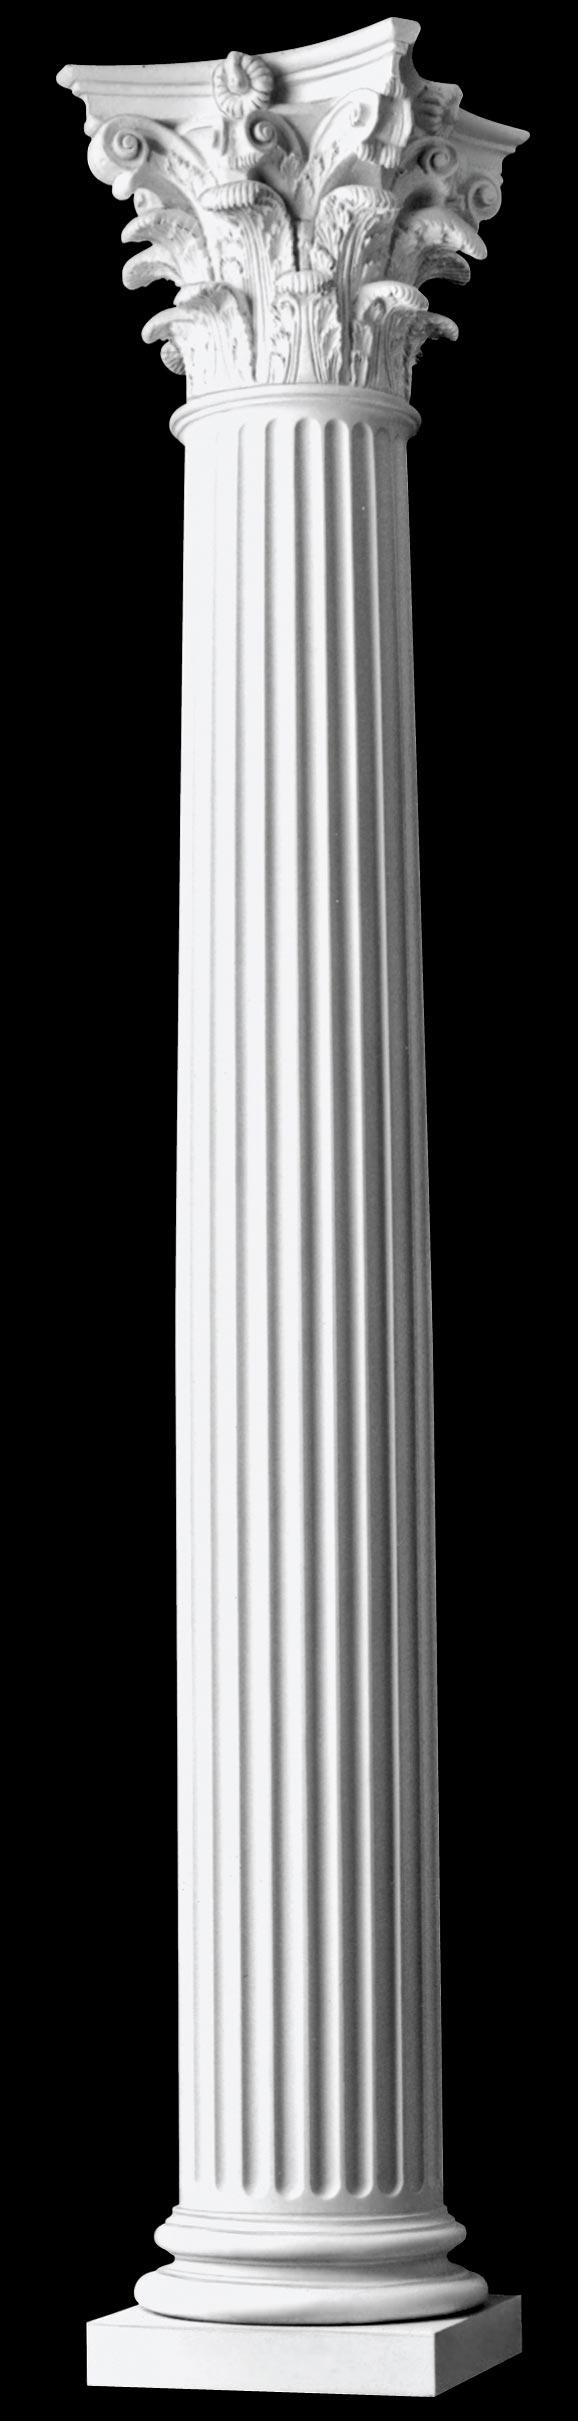 Fluted Roman Columns | PolyStone® Composite Corinthian Columns